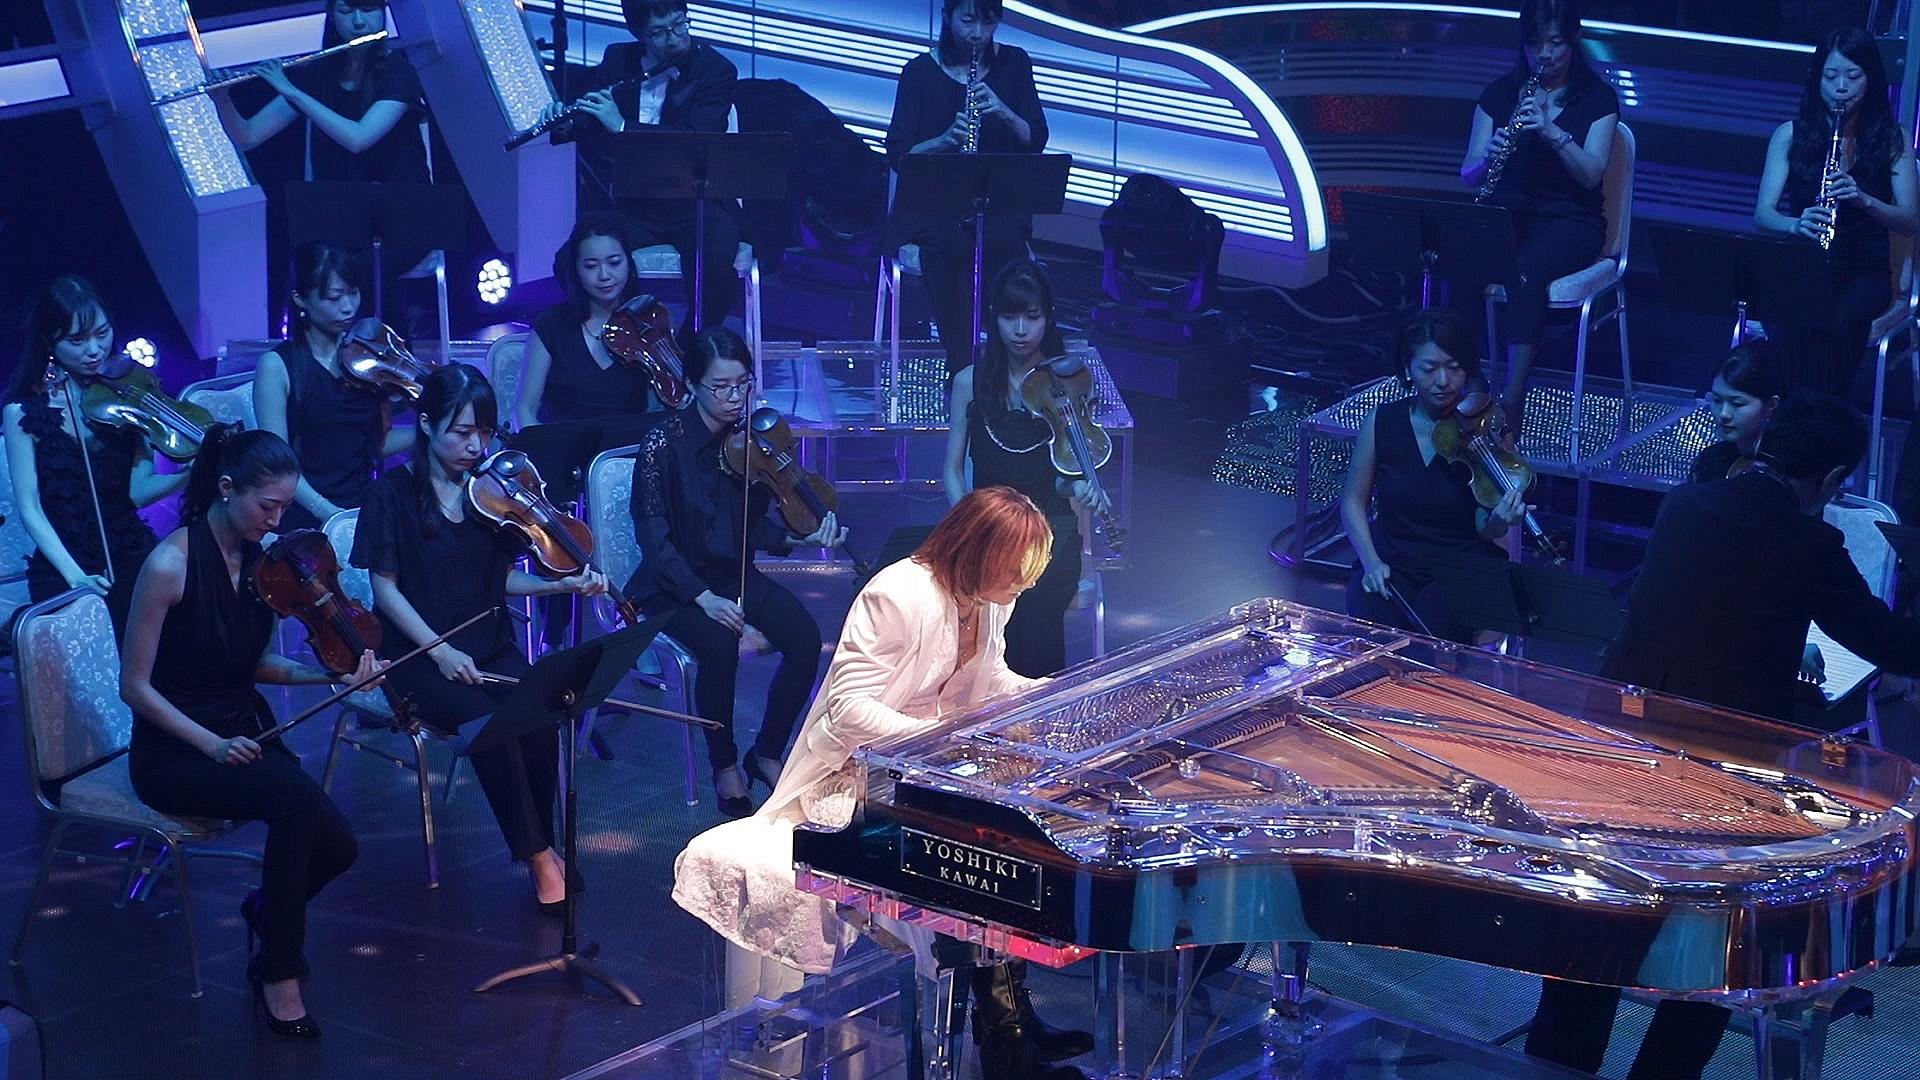 RMMS-Yoshiki-Music-Station-20170918-0010